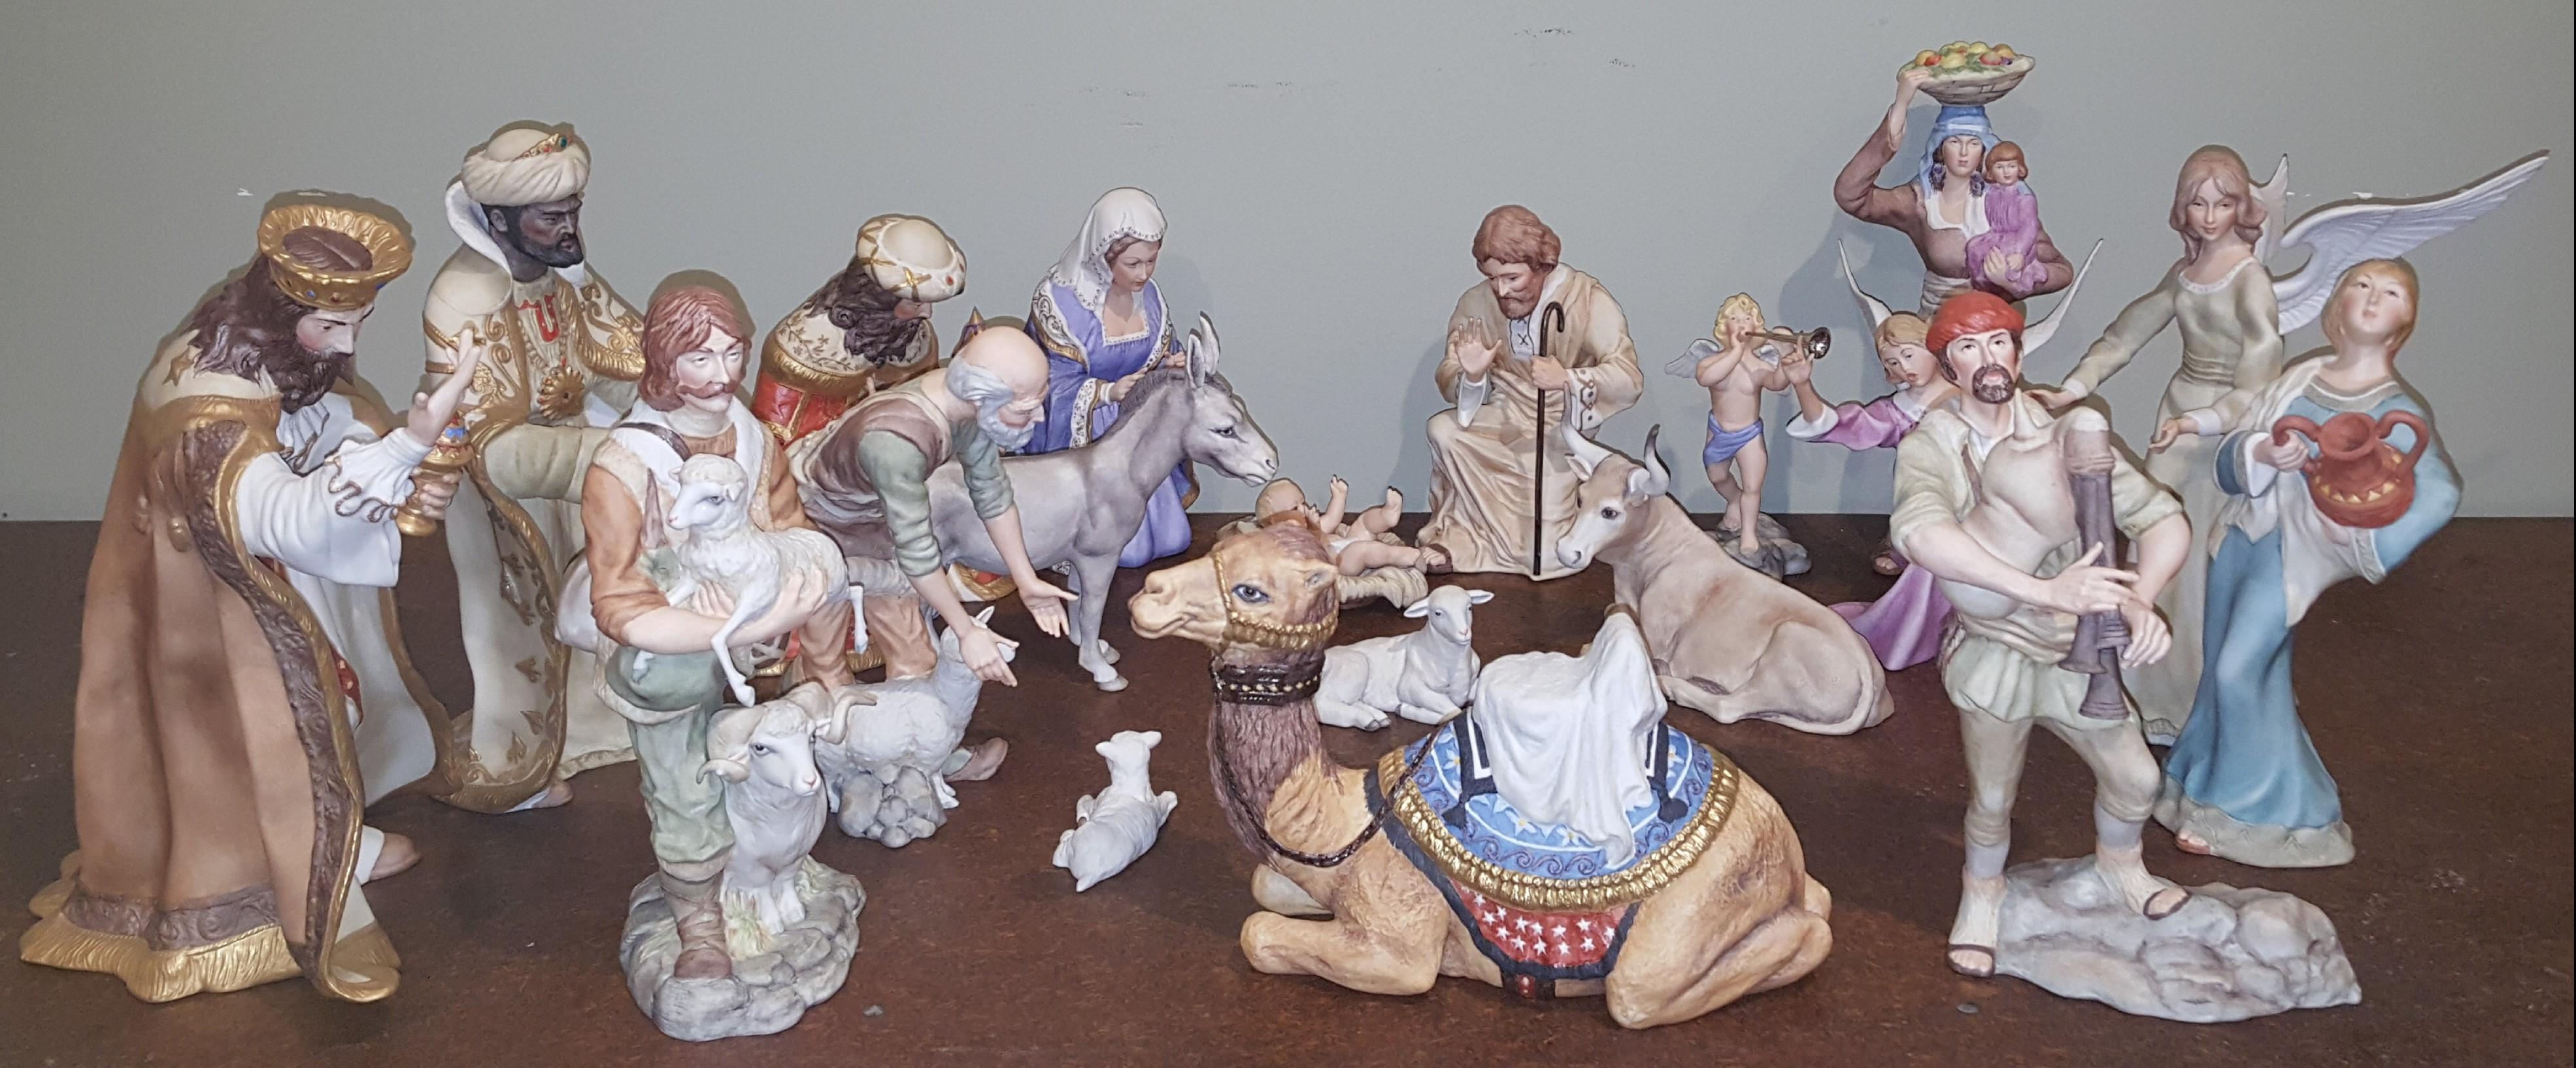 19 Pieces Nativity Set